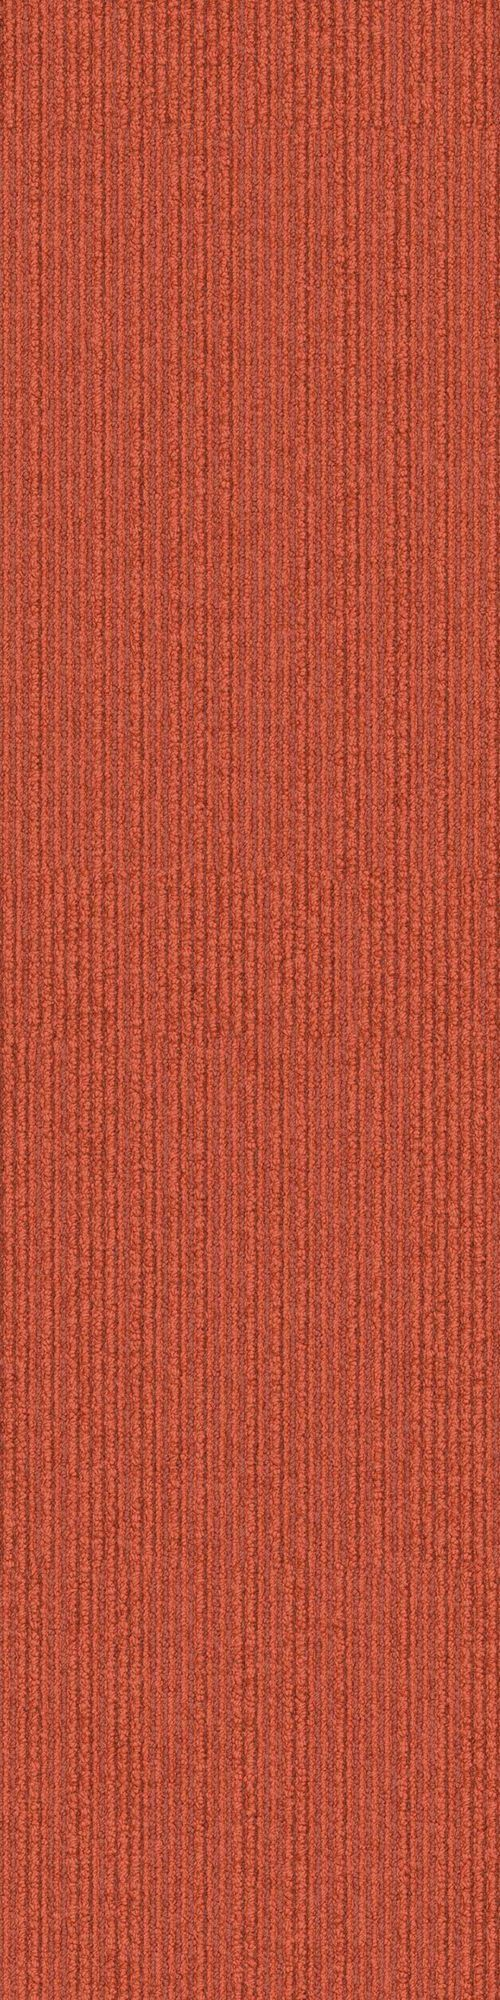 Interface carpet tile: On Line Color name: Mandarin Variant 7